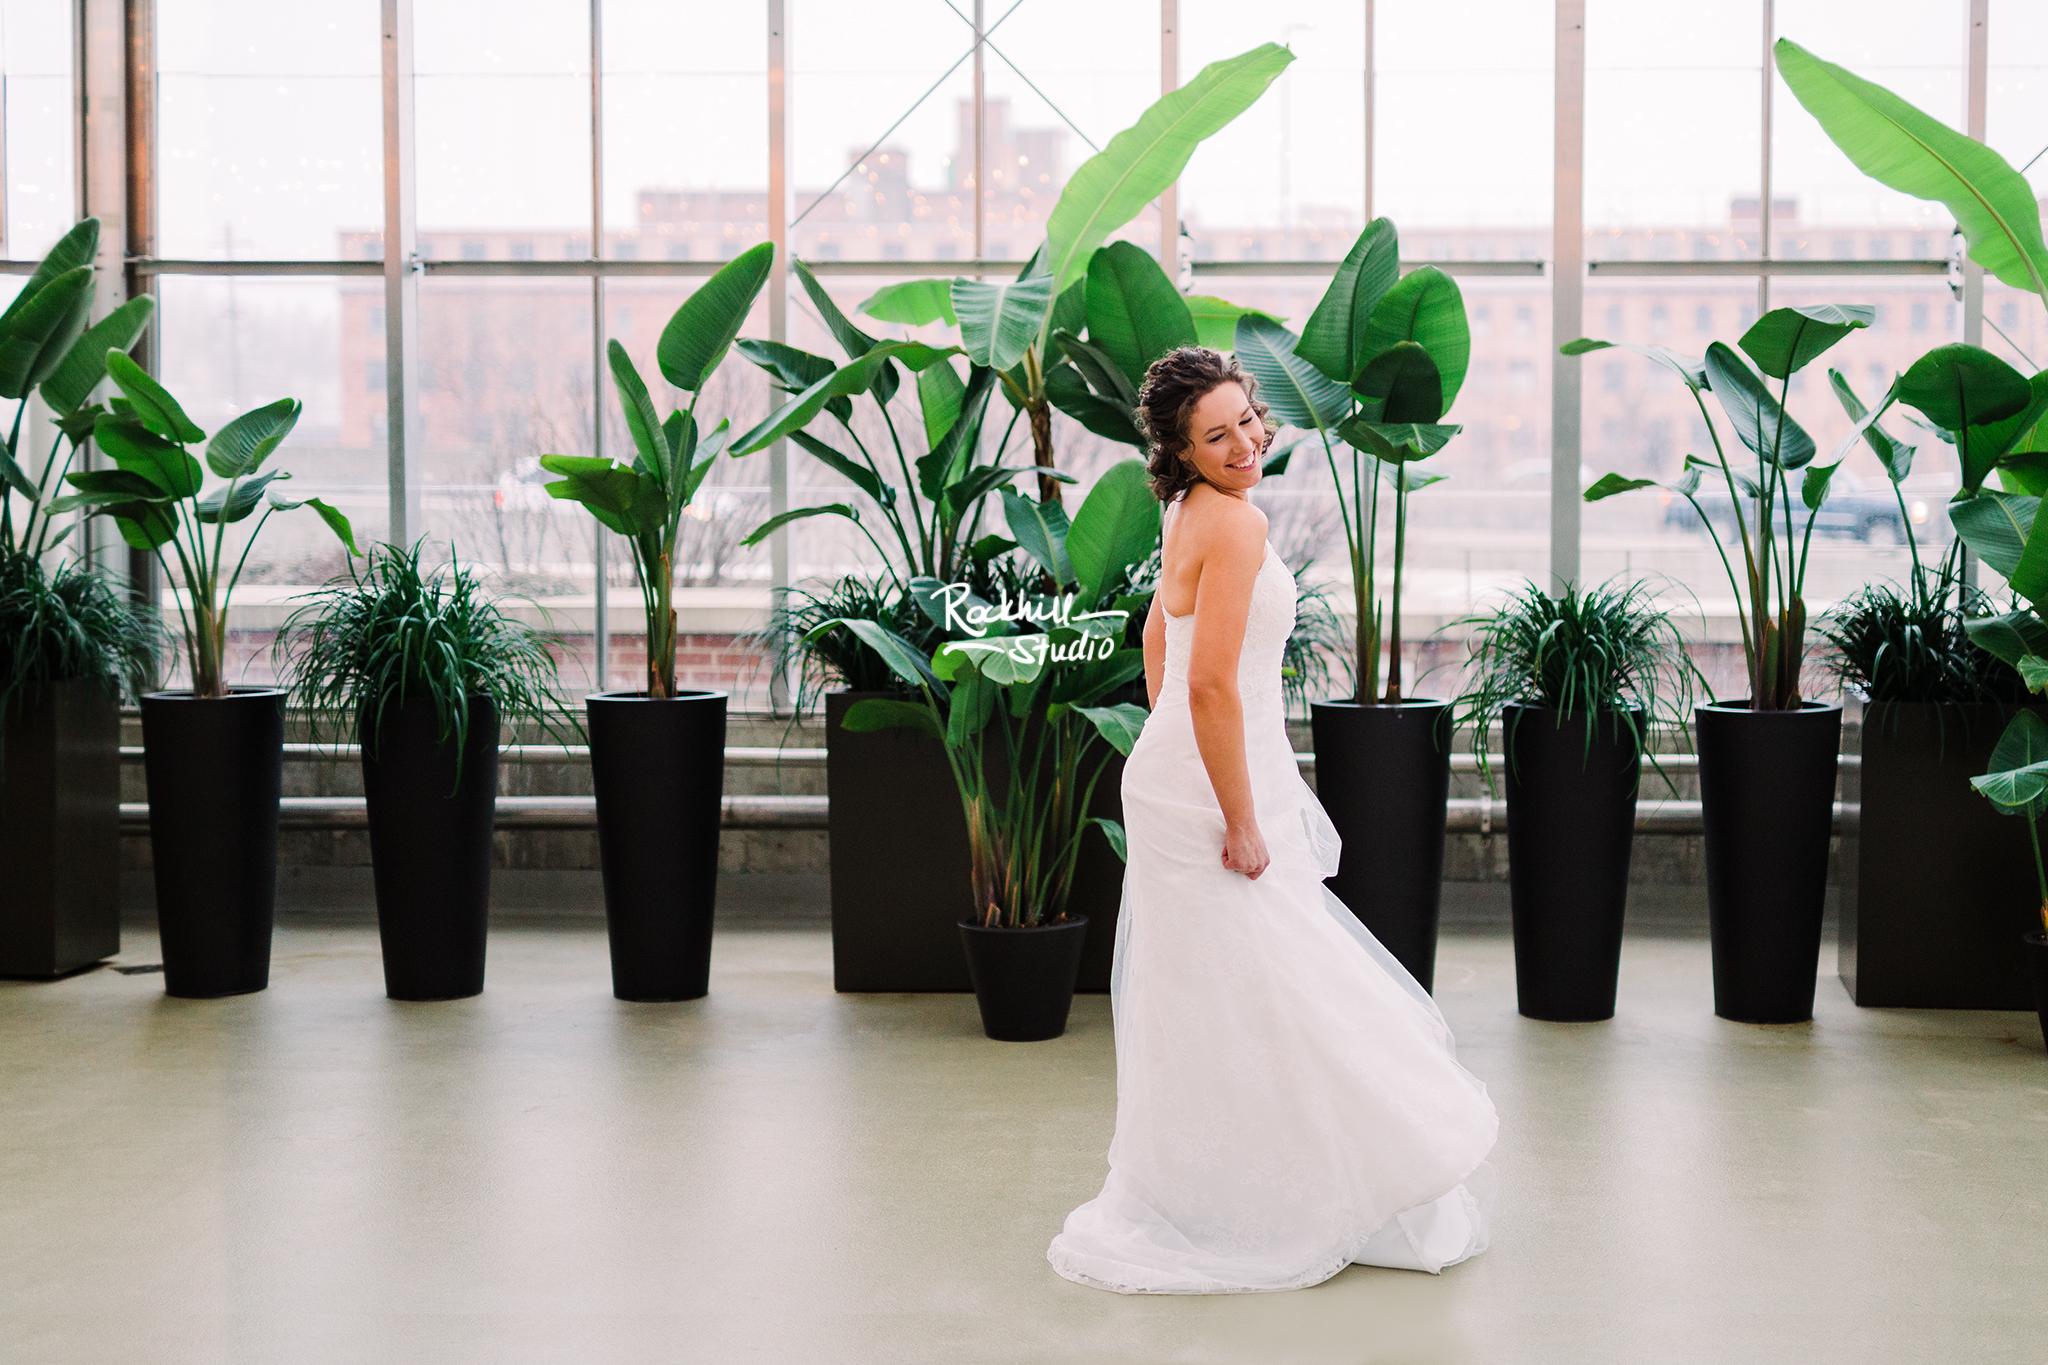 Traverse_city_wedding_Photography_Grand_Rapids_market_rockhill_studio_1a.jpg